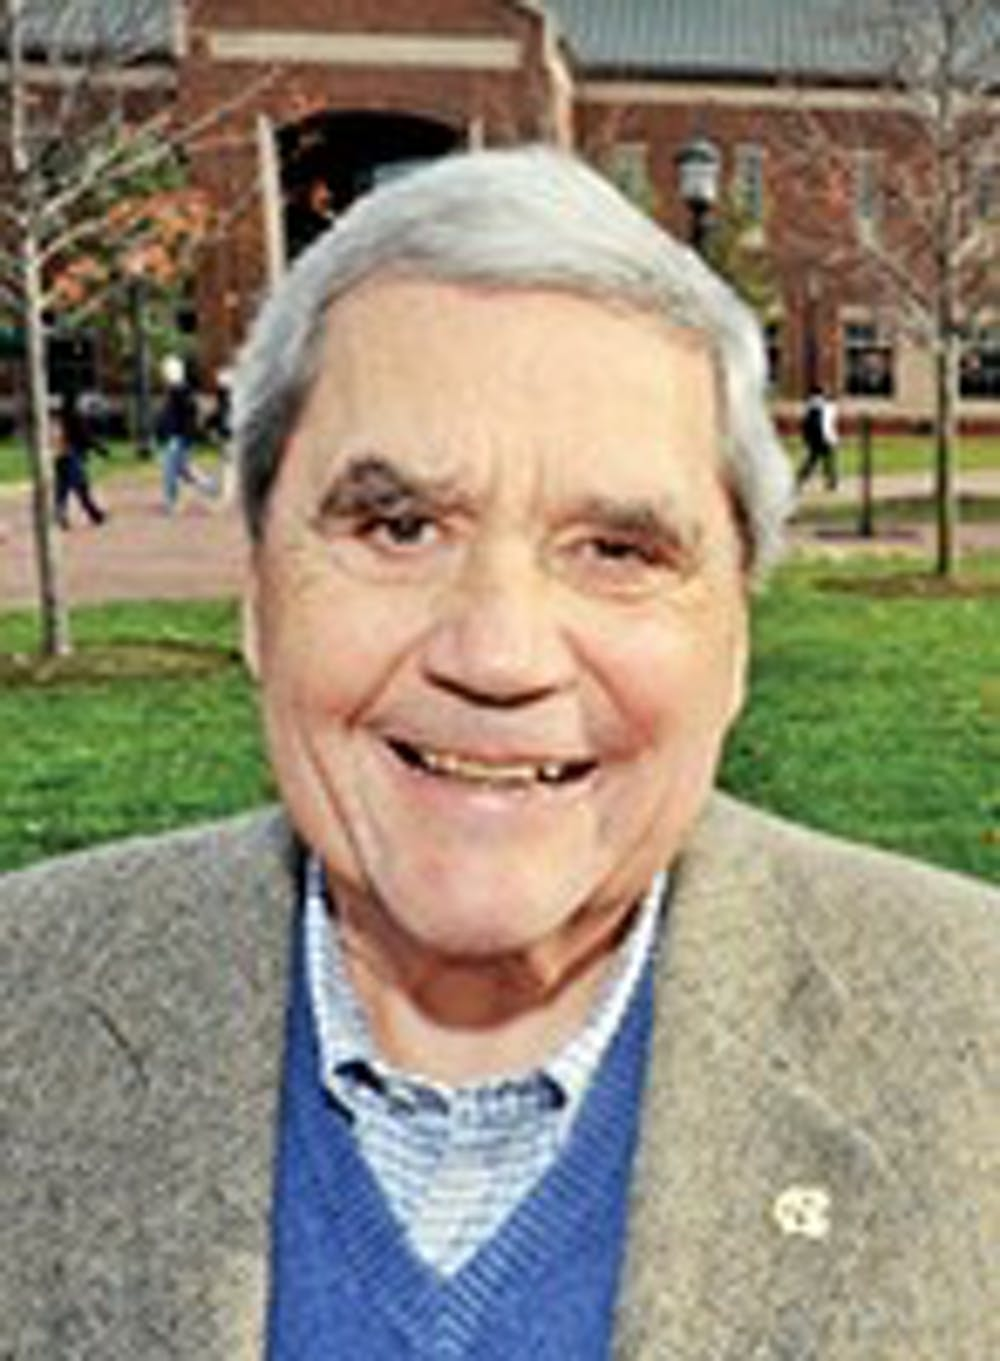 Former mayor Jonathan Howes dies at 78